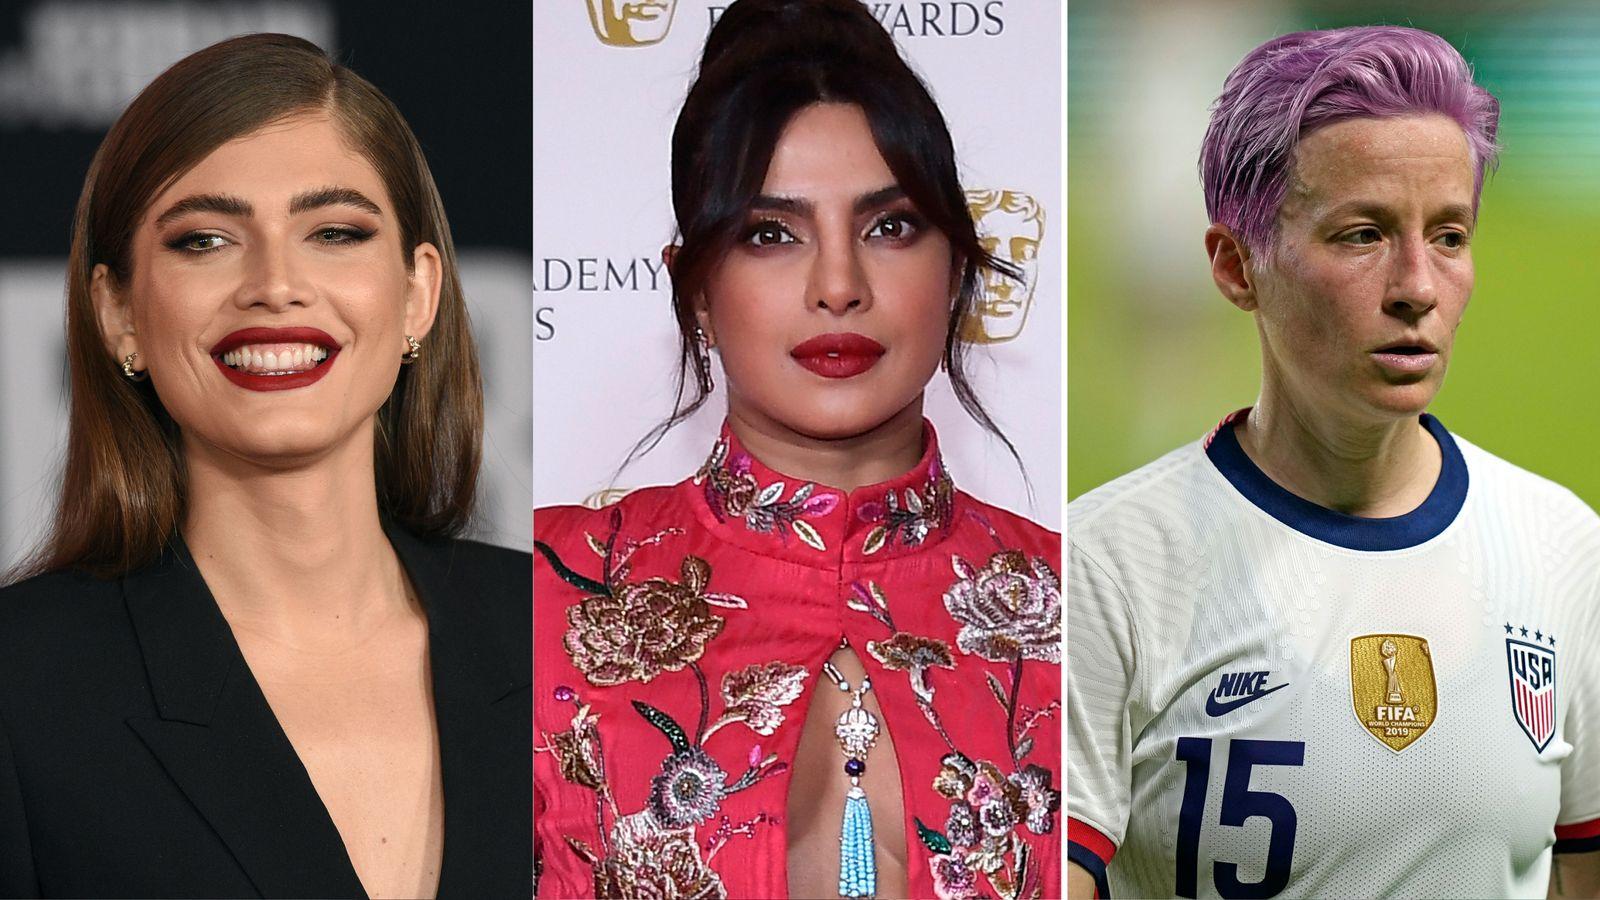 Victoria's Secret rebrand: Priyanka Chopra, Megan Rapinoe and Valentina Sampaio join as new ambassadors | Ents & Arts News | Sky News